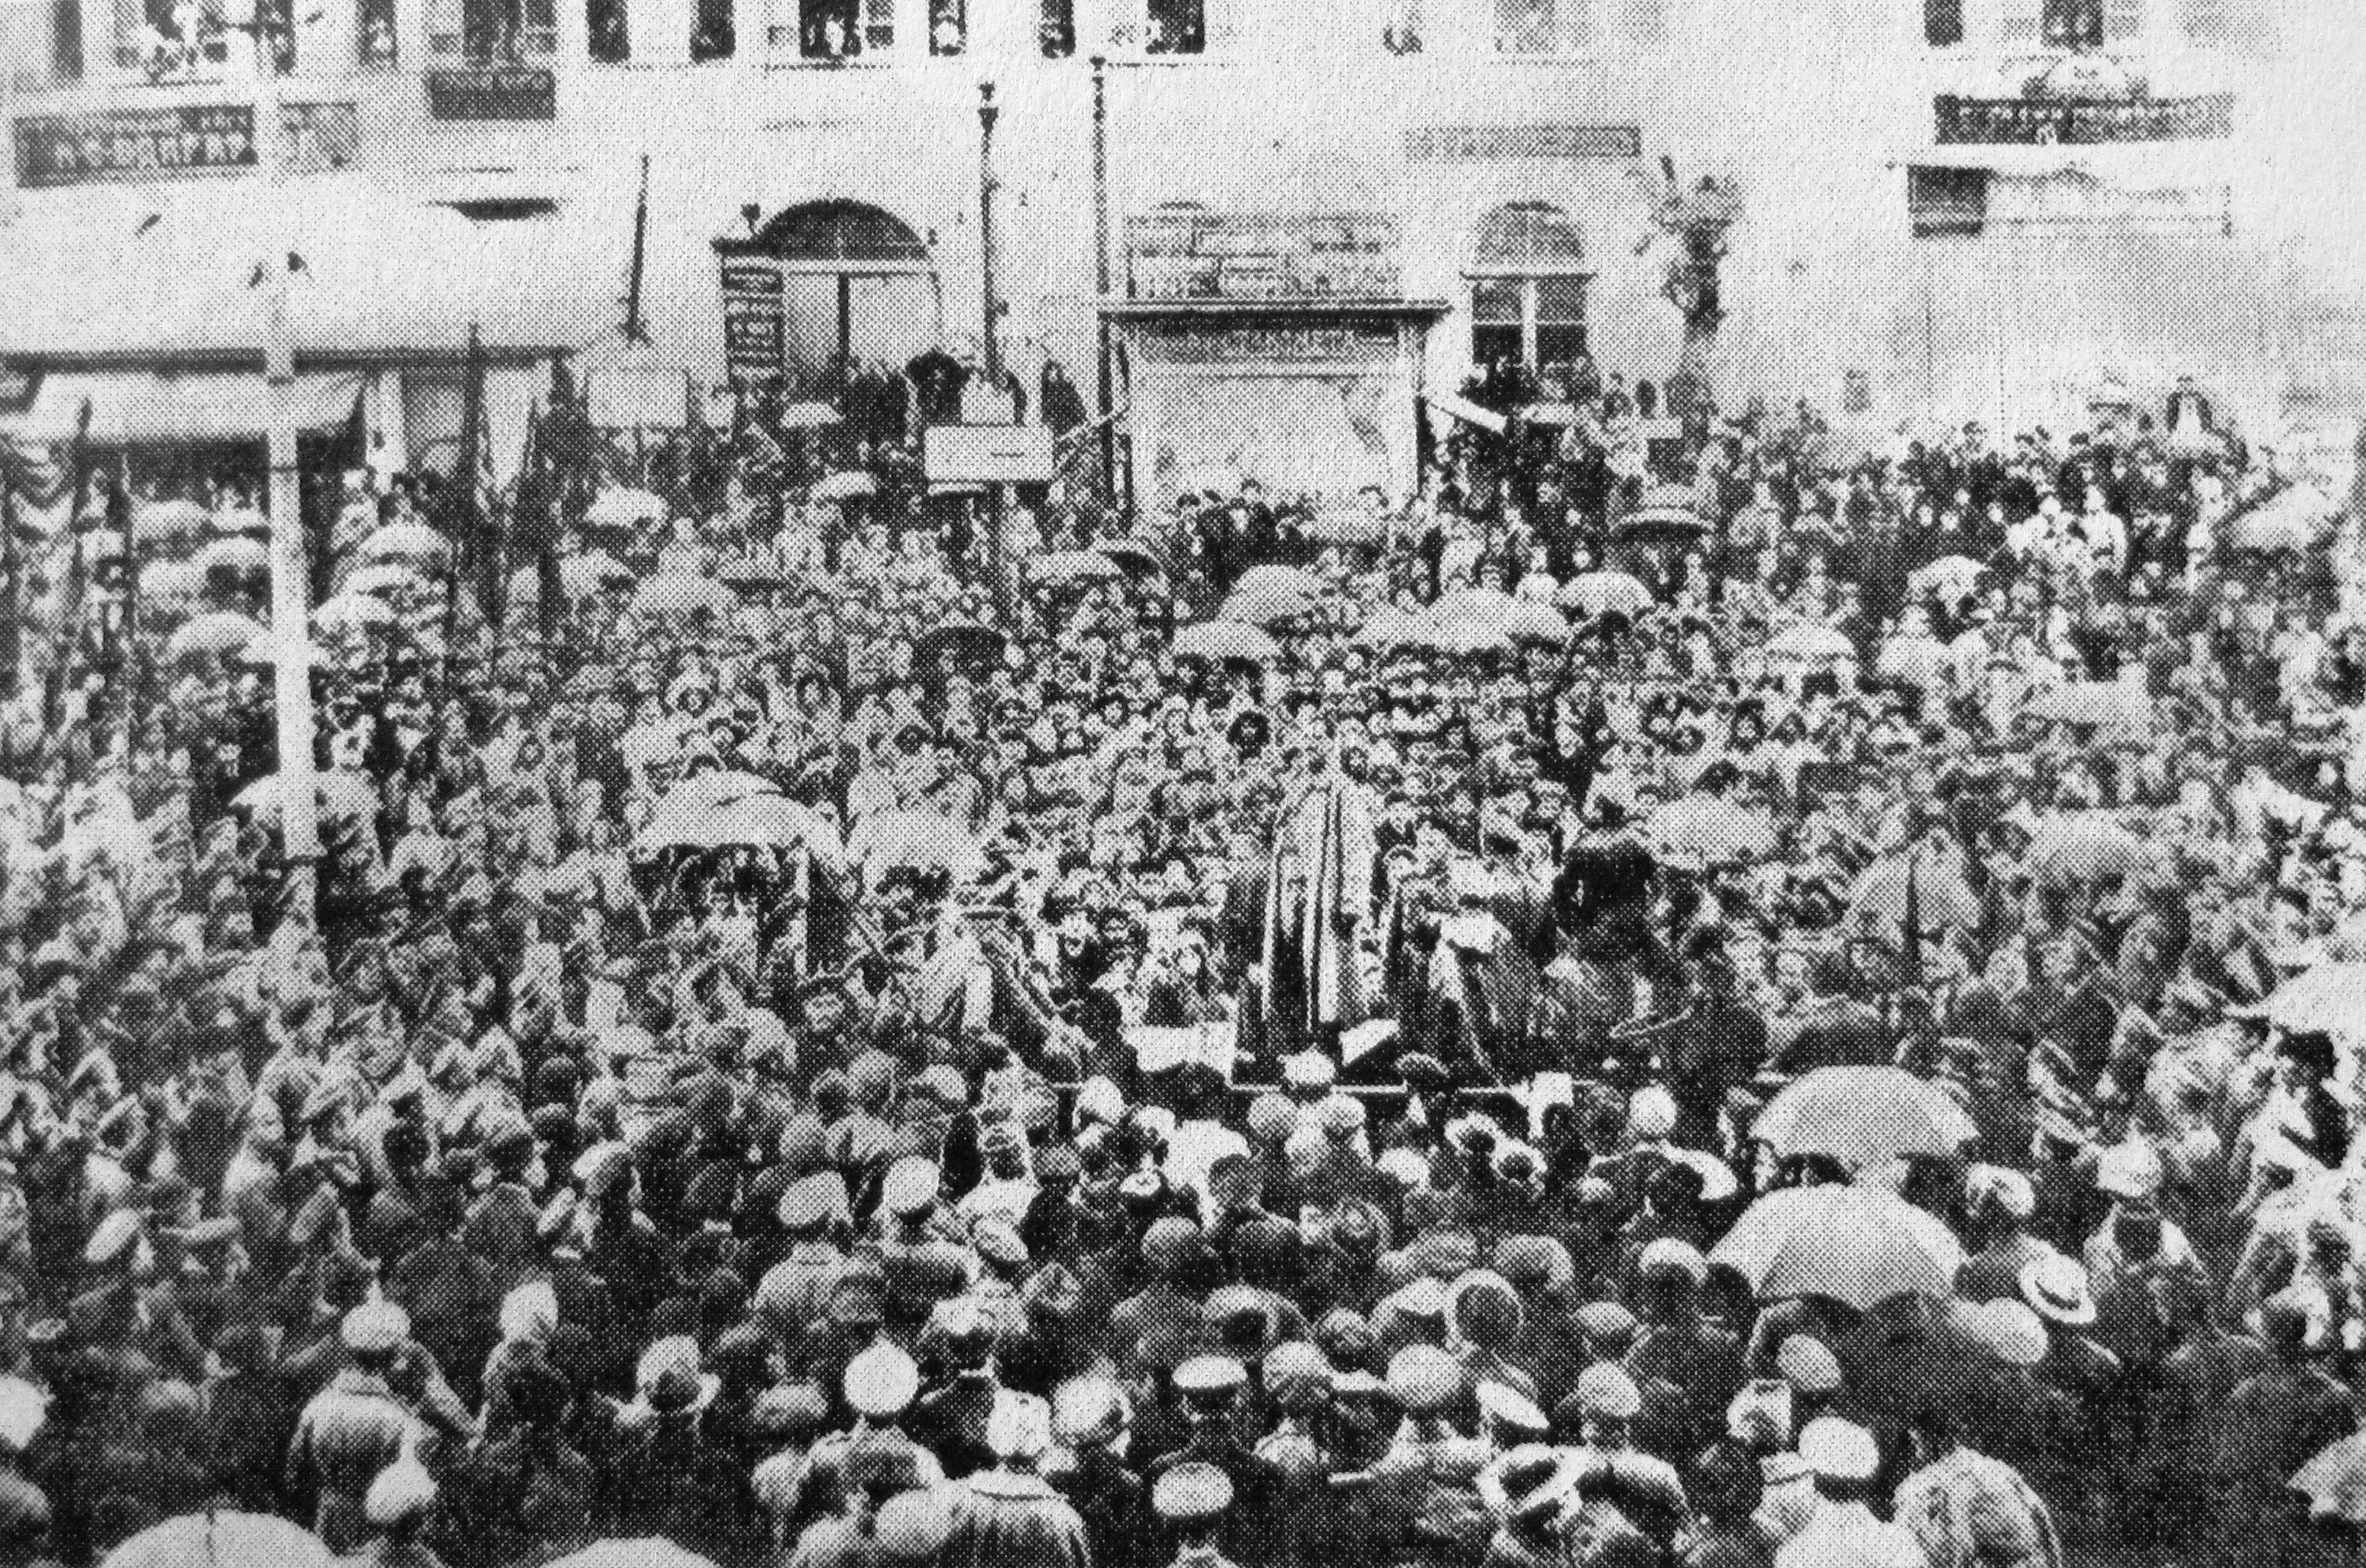 Russian revolution february 1917 essay